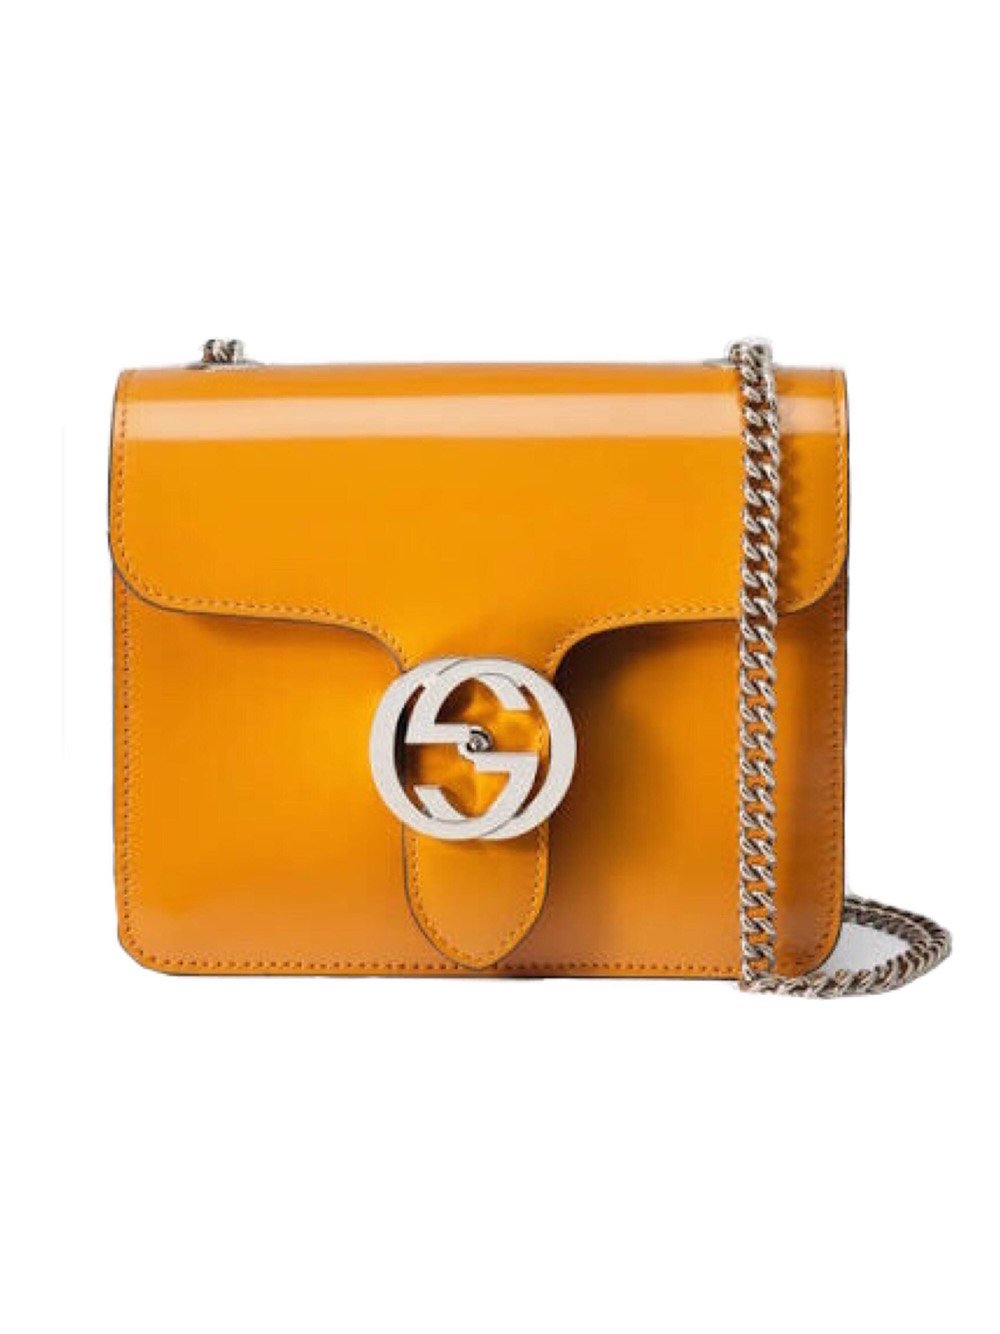 Gucci Interlocking Clutch Bag